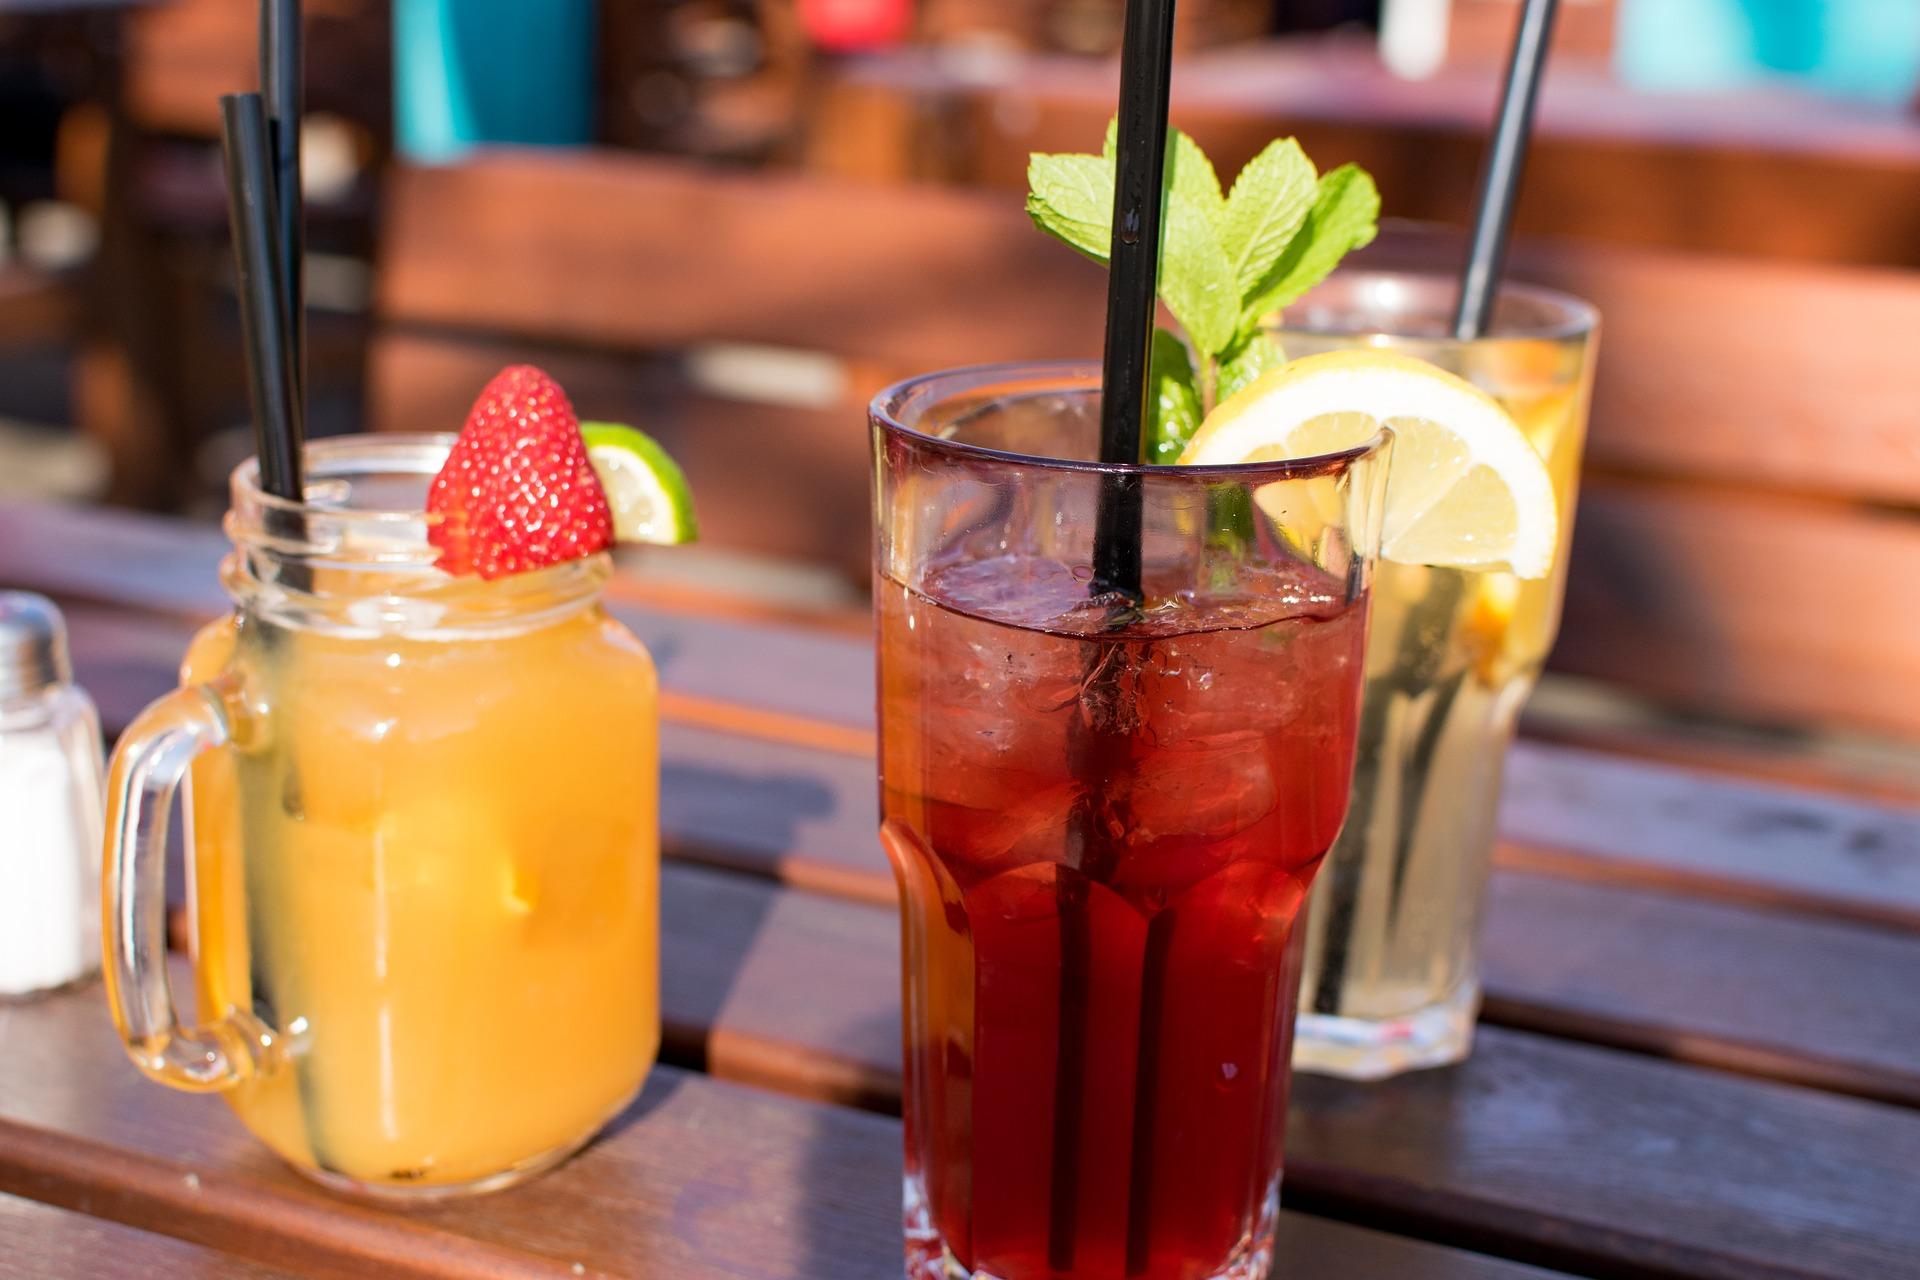 Start a Juice Bar franchise business